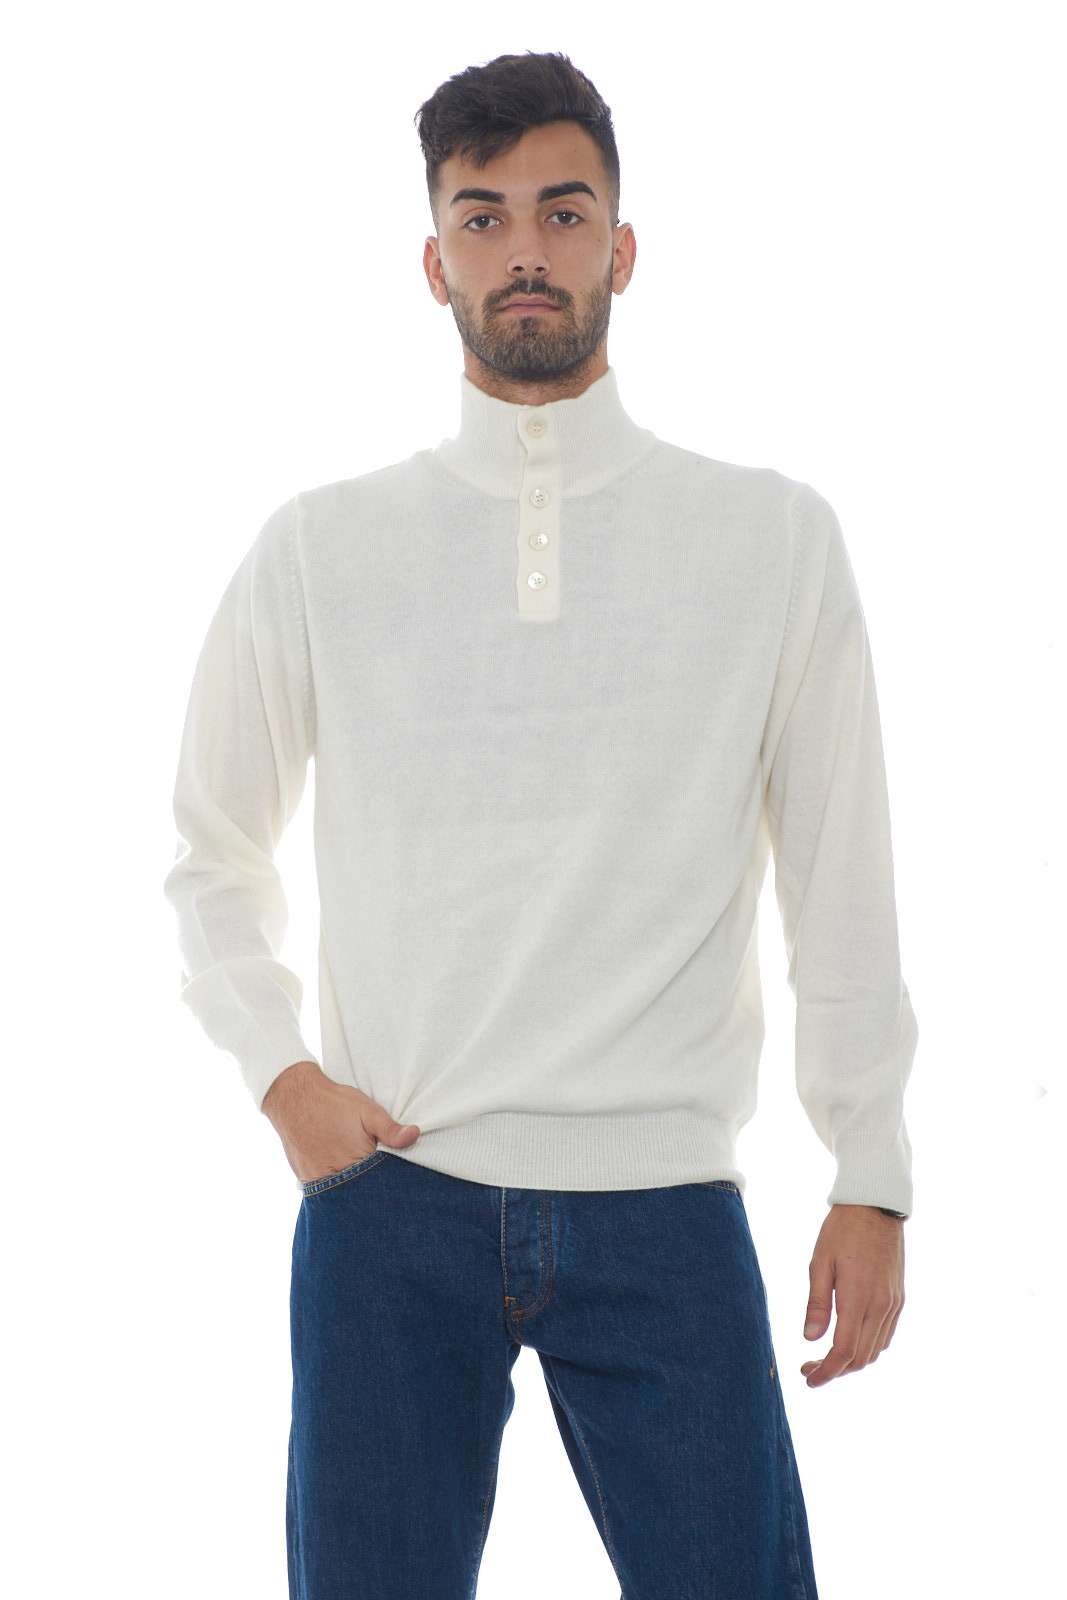 https://www.parmax.com/media/catalog/product/a/i/AI-outlet_parmax-maglia-uomo-Acquapura-003-A.jpg